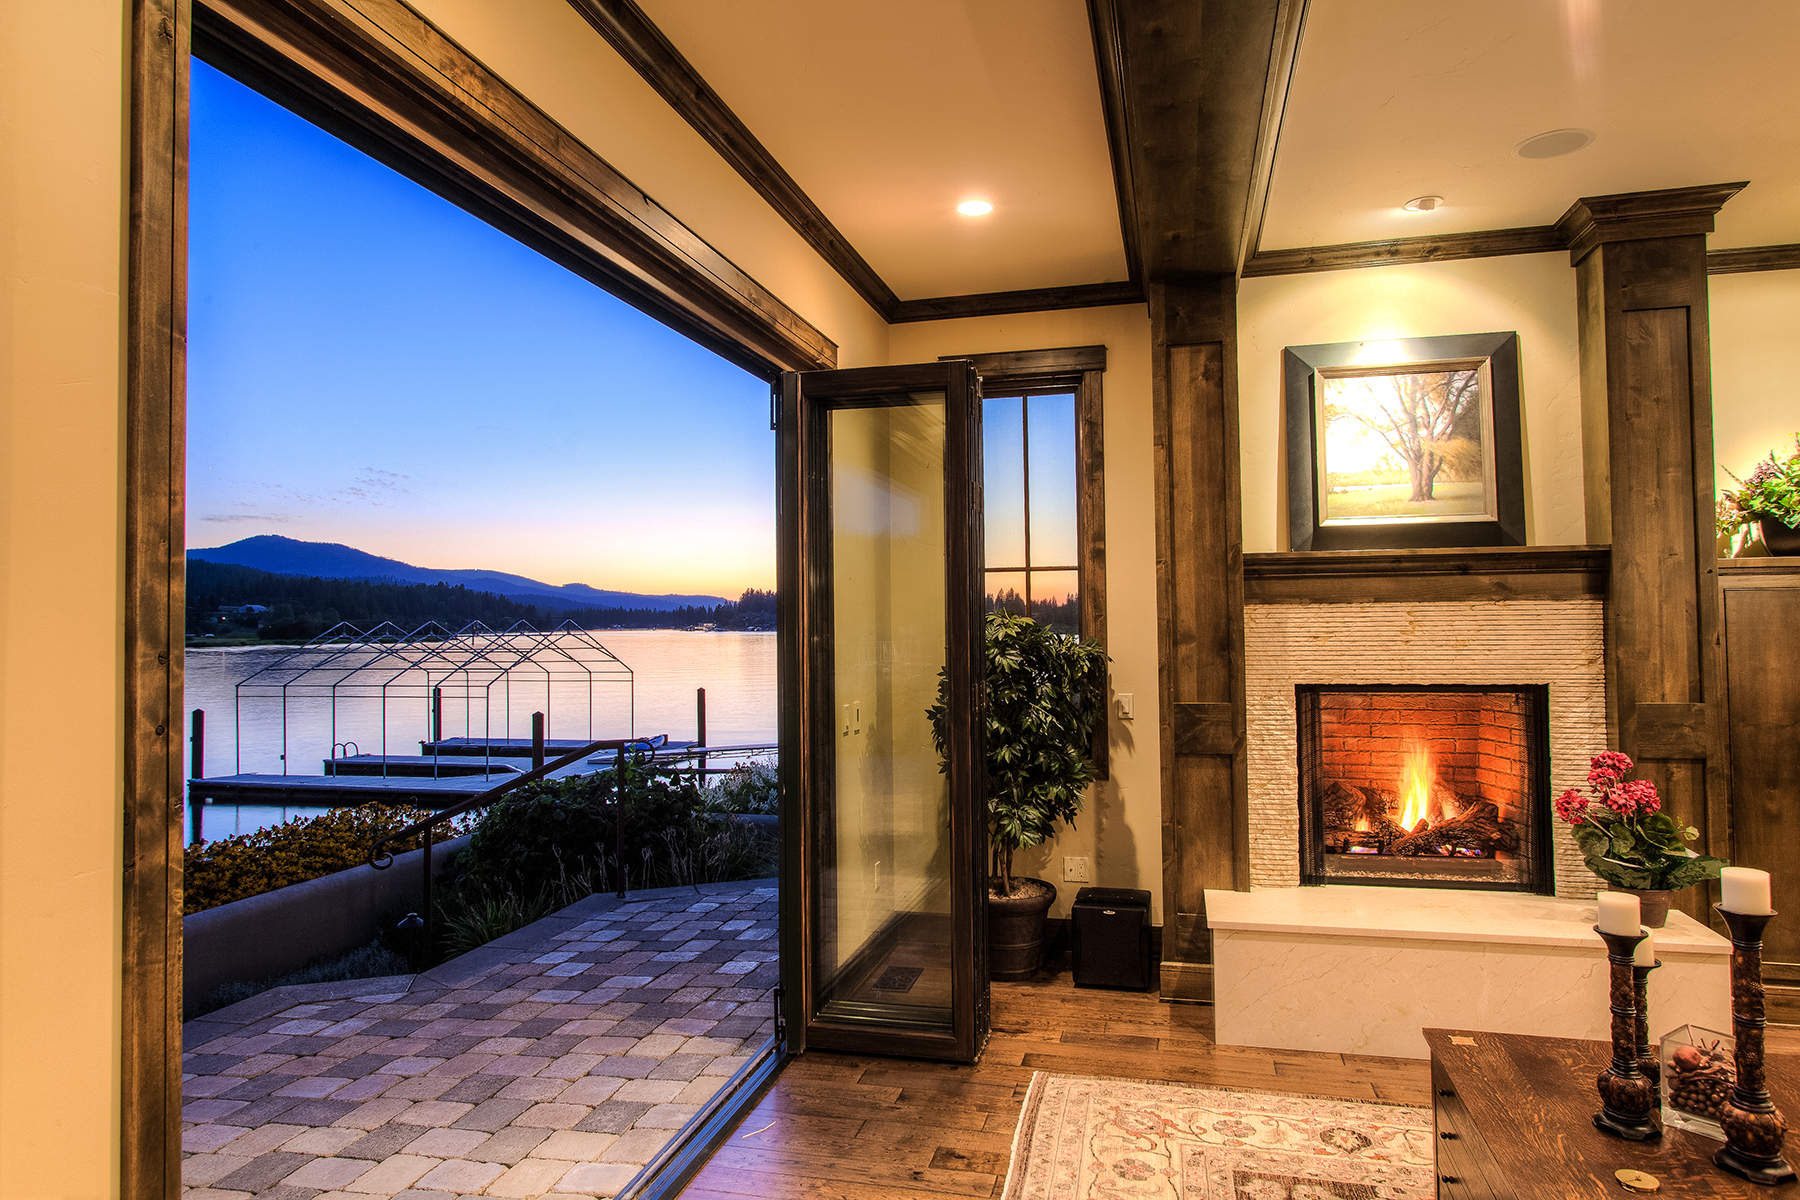 其他住宅 為 出售 在 Luxurious Riverfront Home 3852 W Shoreview Ln Coeur D Alene, 愛達荷州 83814 美國